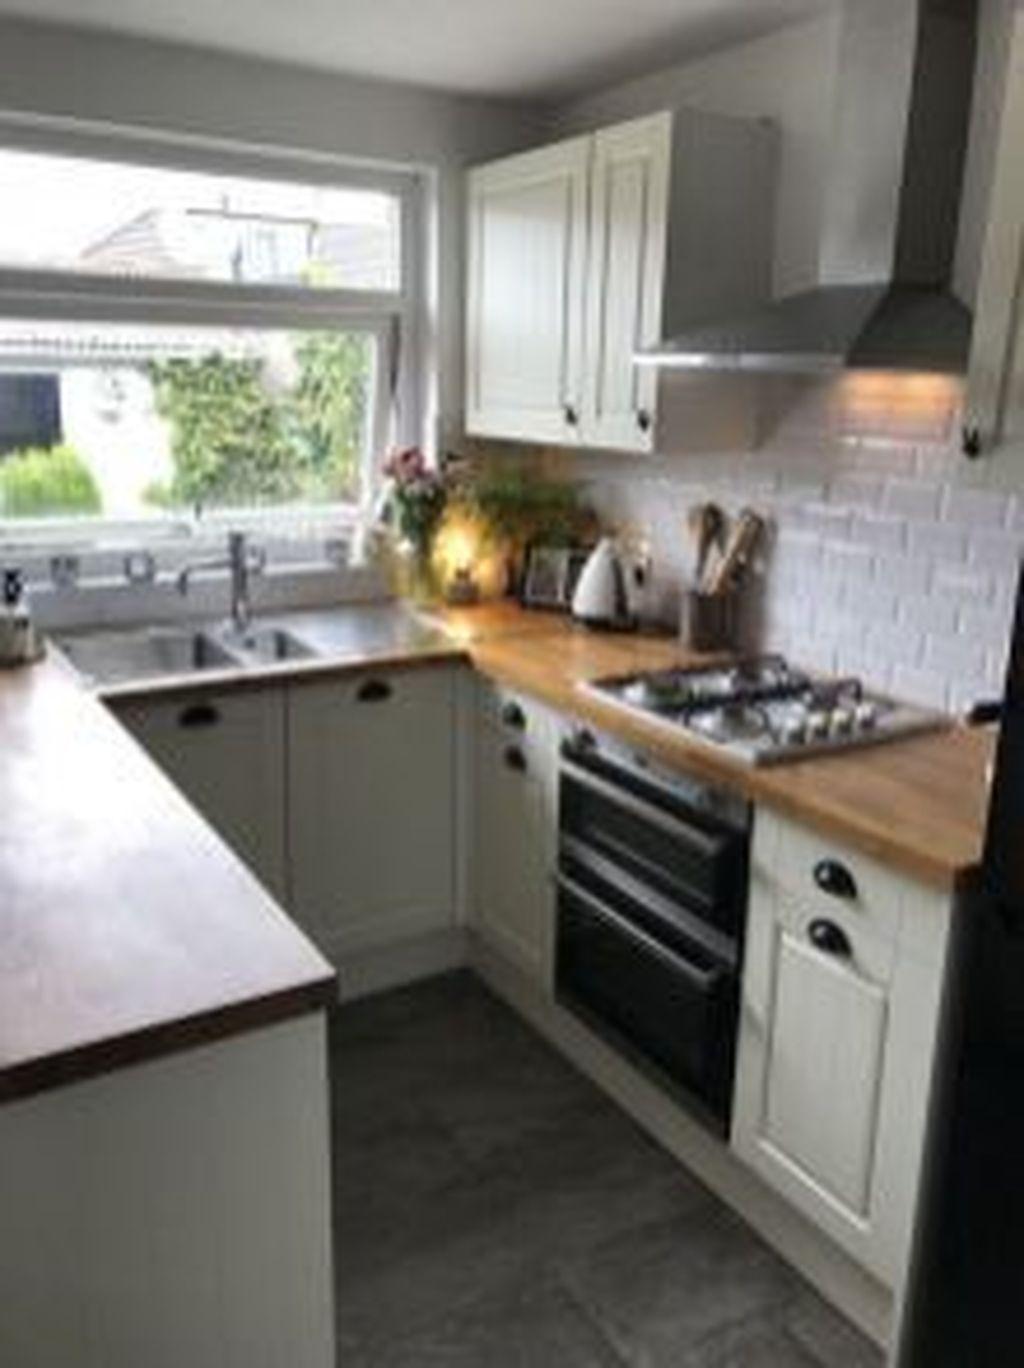 Brilliant Small Kitchen Remodel Design Ideas On A Budget 26